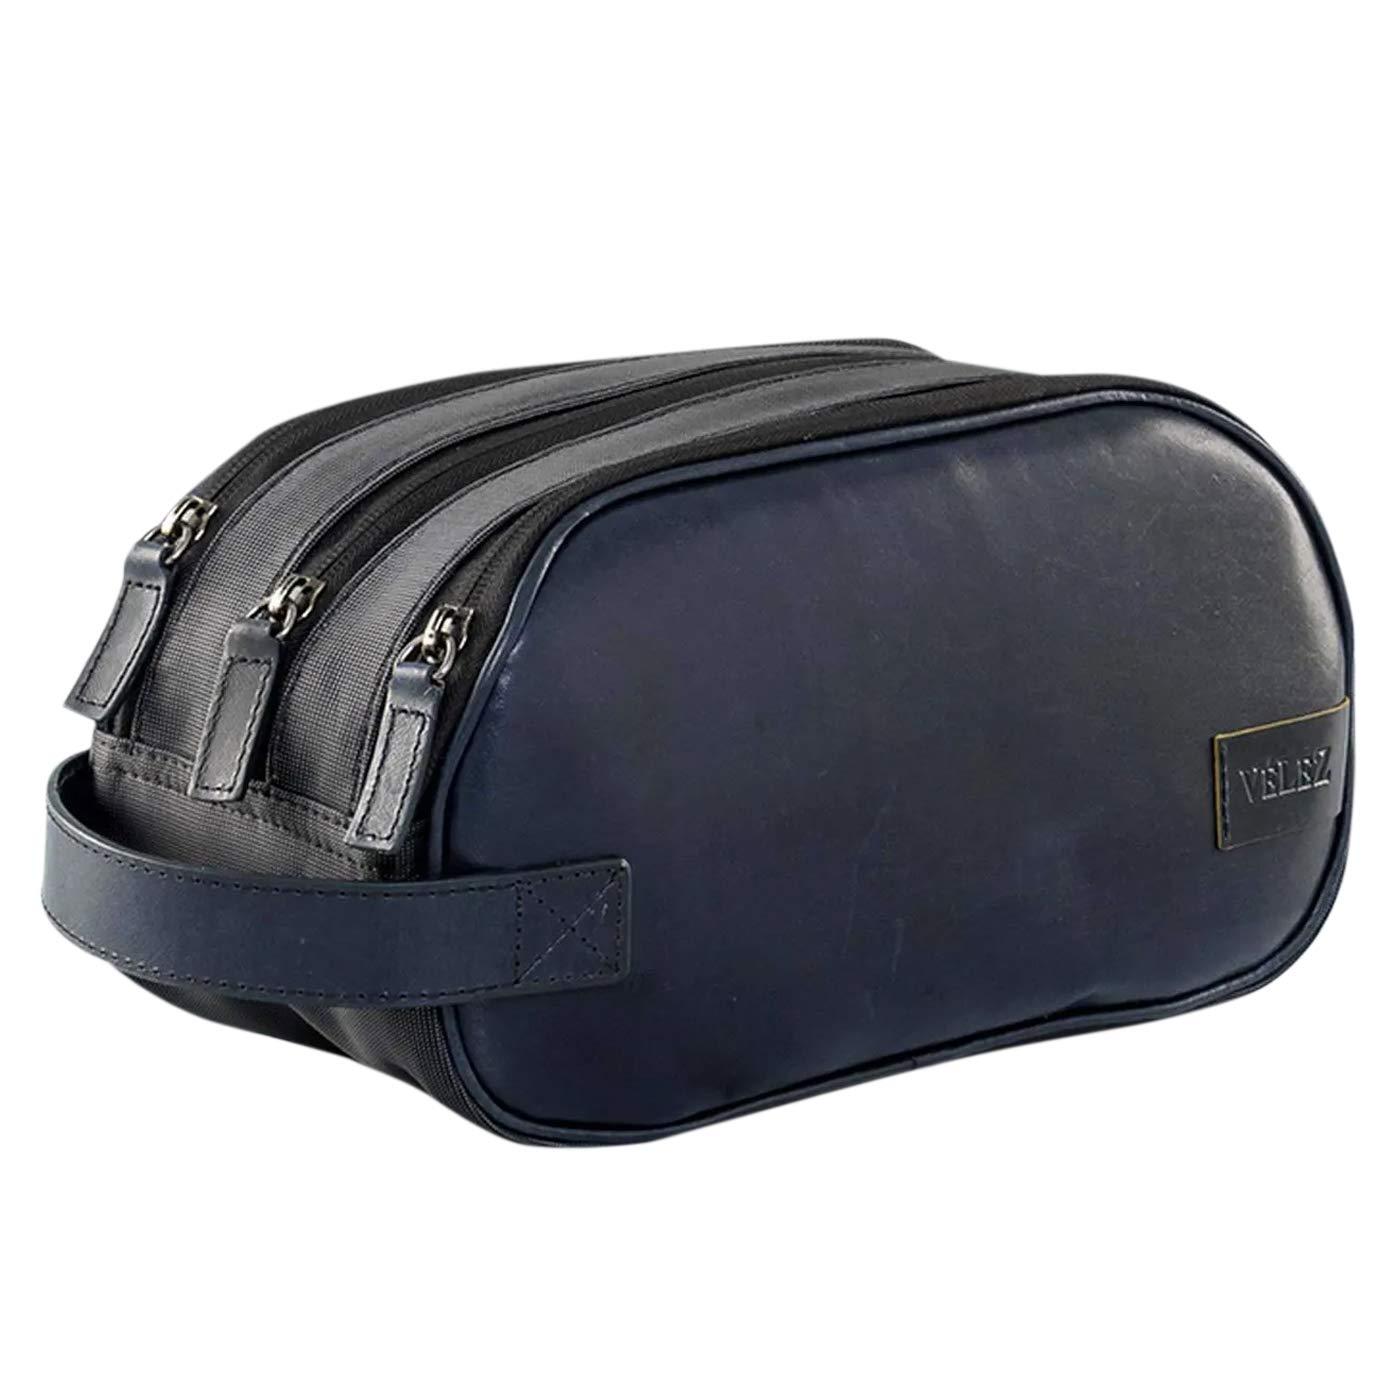 VELEZ 1019638 Colombian Genuine Leather Toiletry Bag for Men Blue by VELEZ